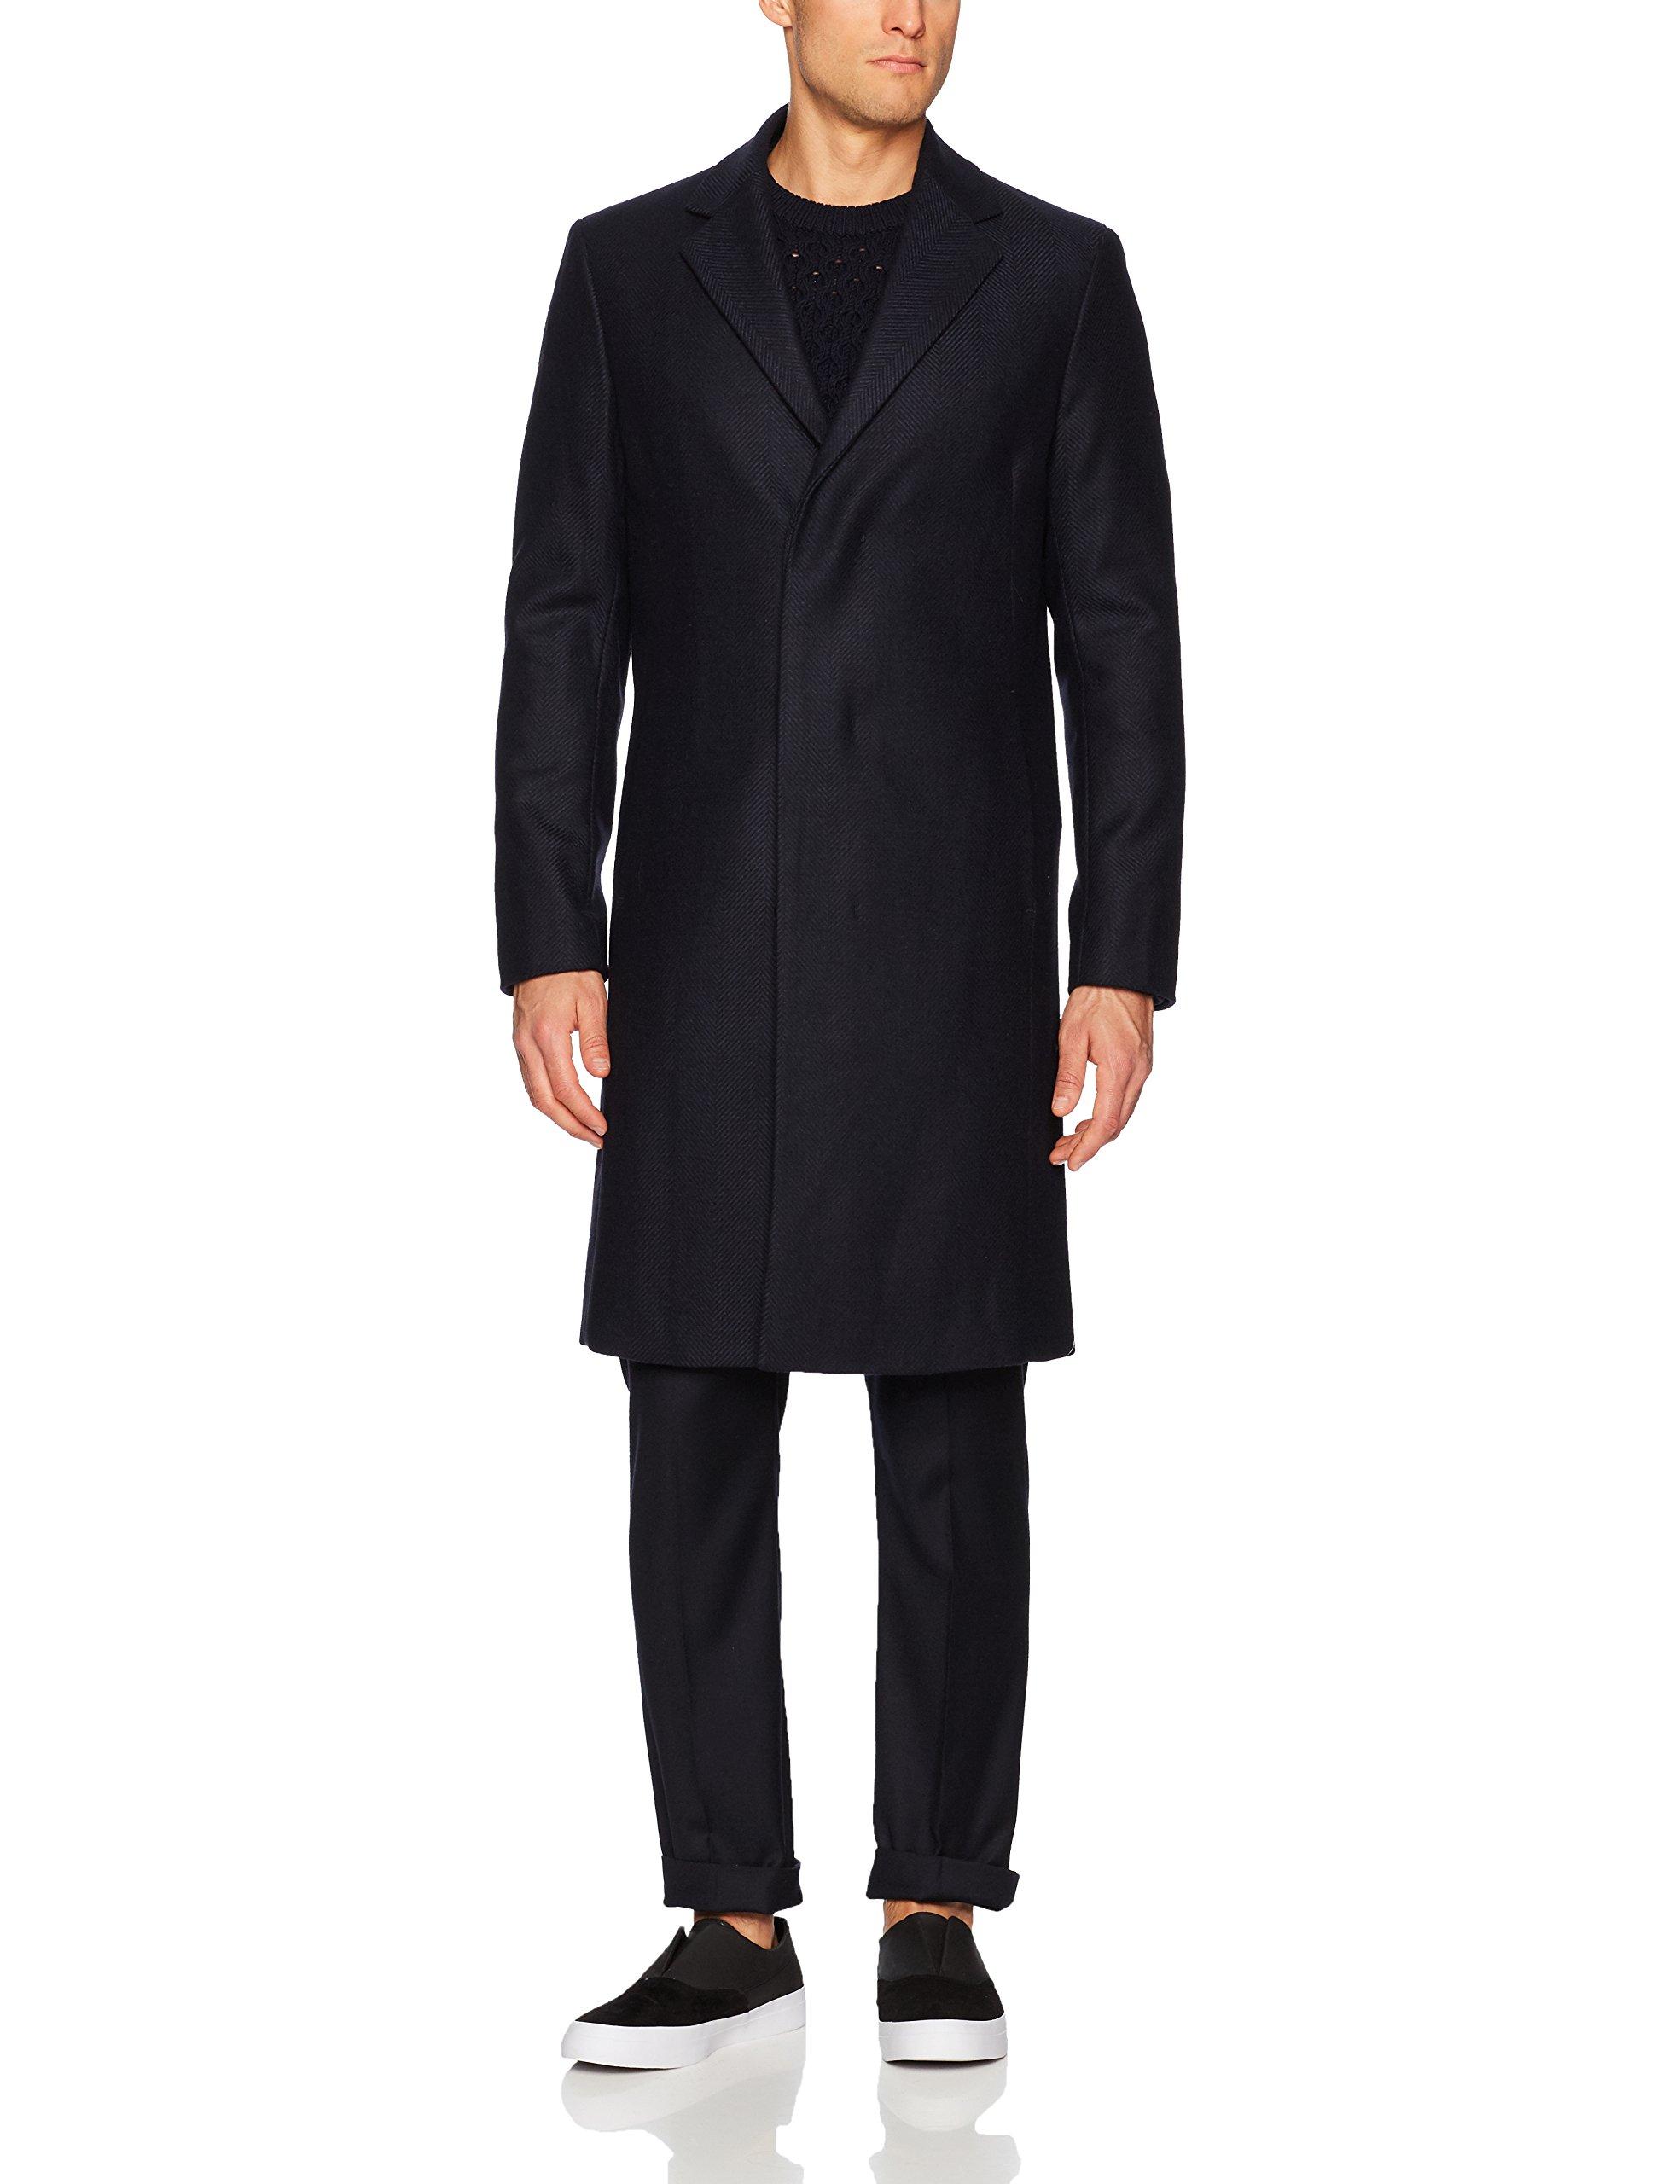 Theory Men's Wool Over Coat In Herringbone, Liberty Multi, M